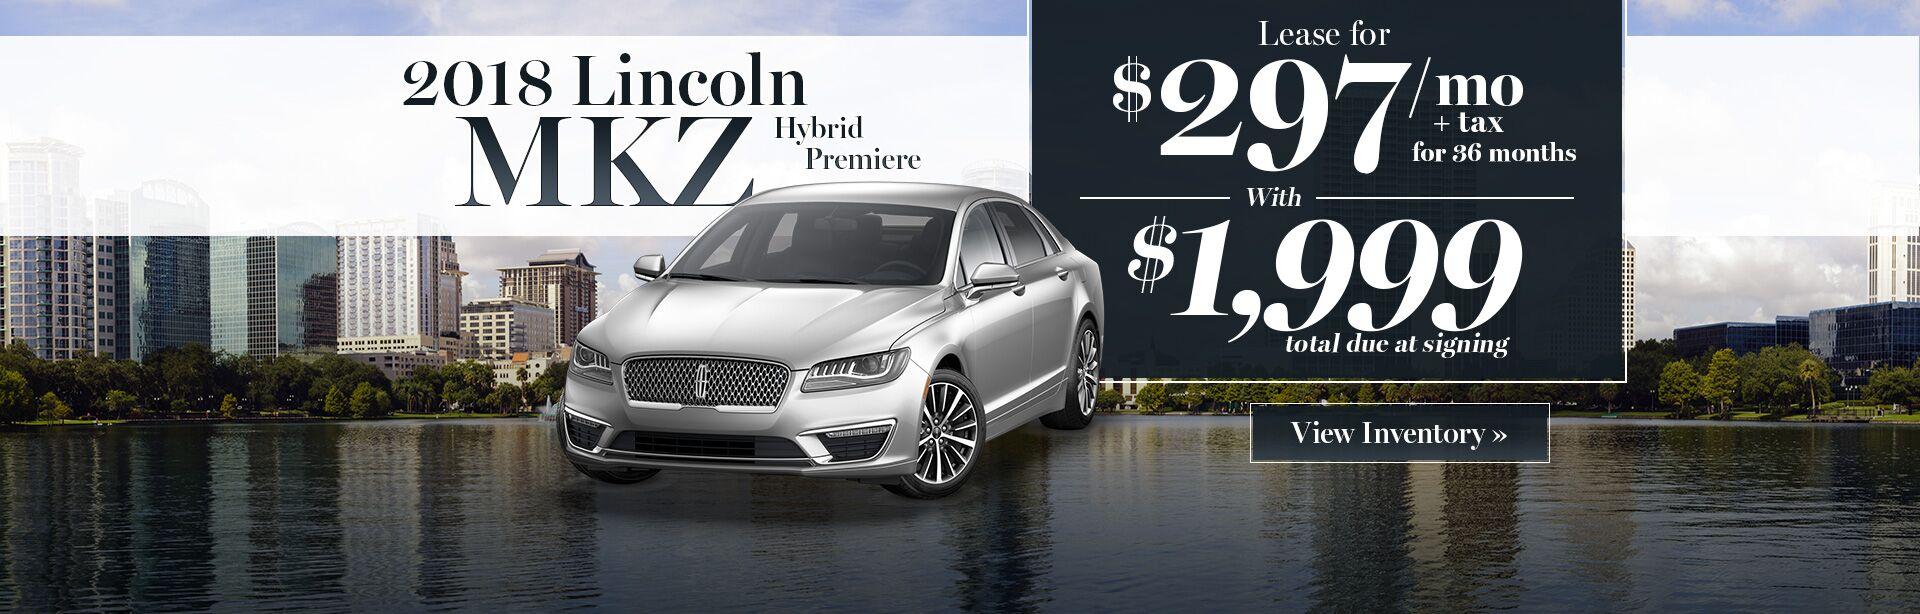 Lincoln Dealer Orlando Fl Central Florida Lincoln